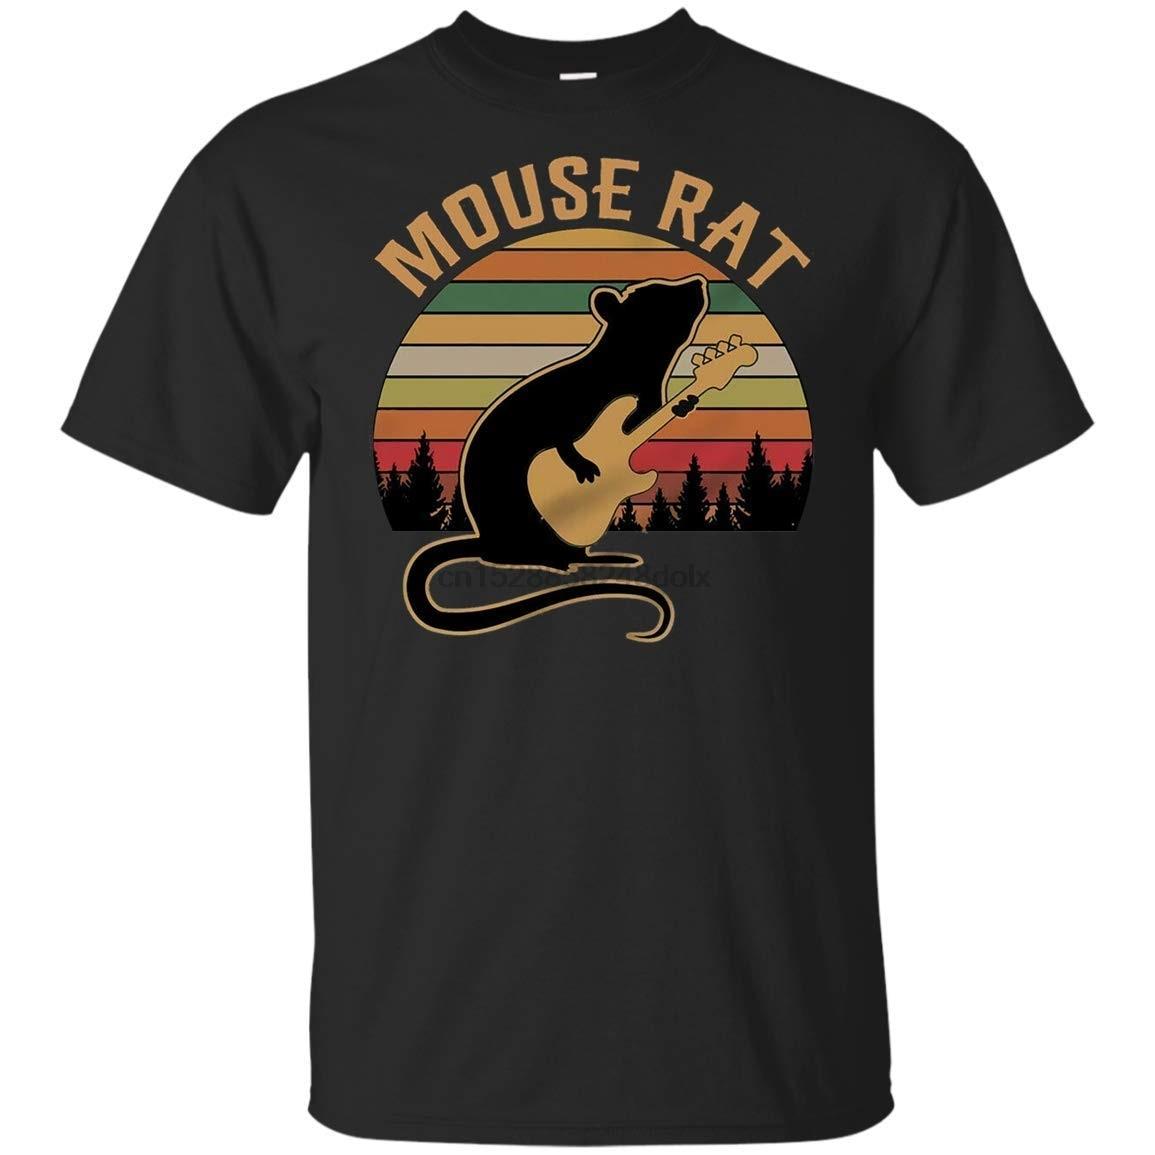 Мужская футболка Dwyer Parks and Mouse Rat Andy в винтажном ретро стиле